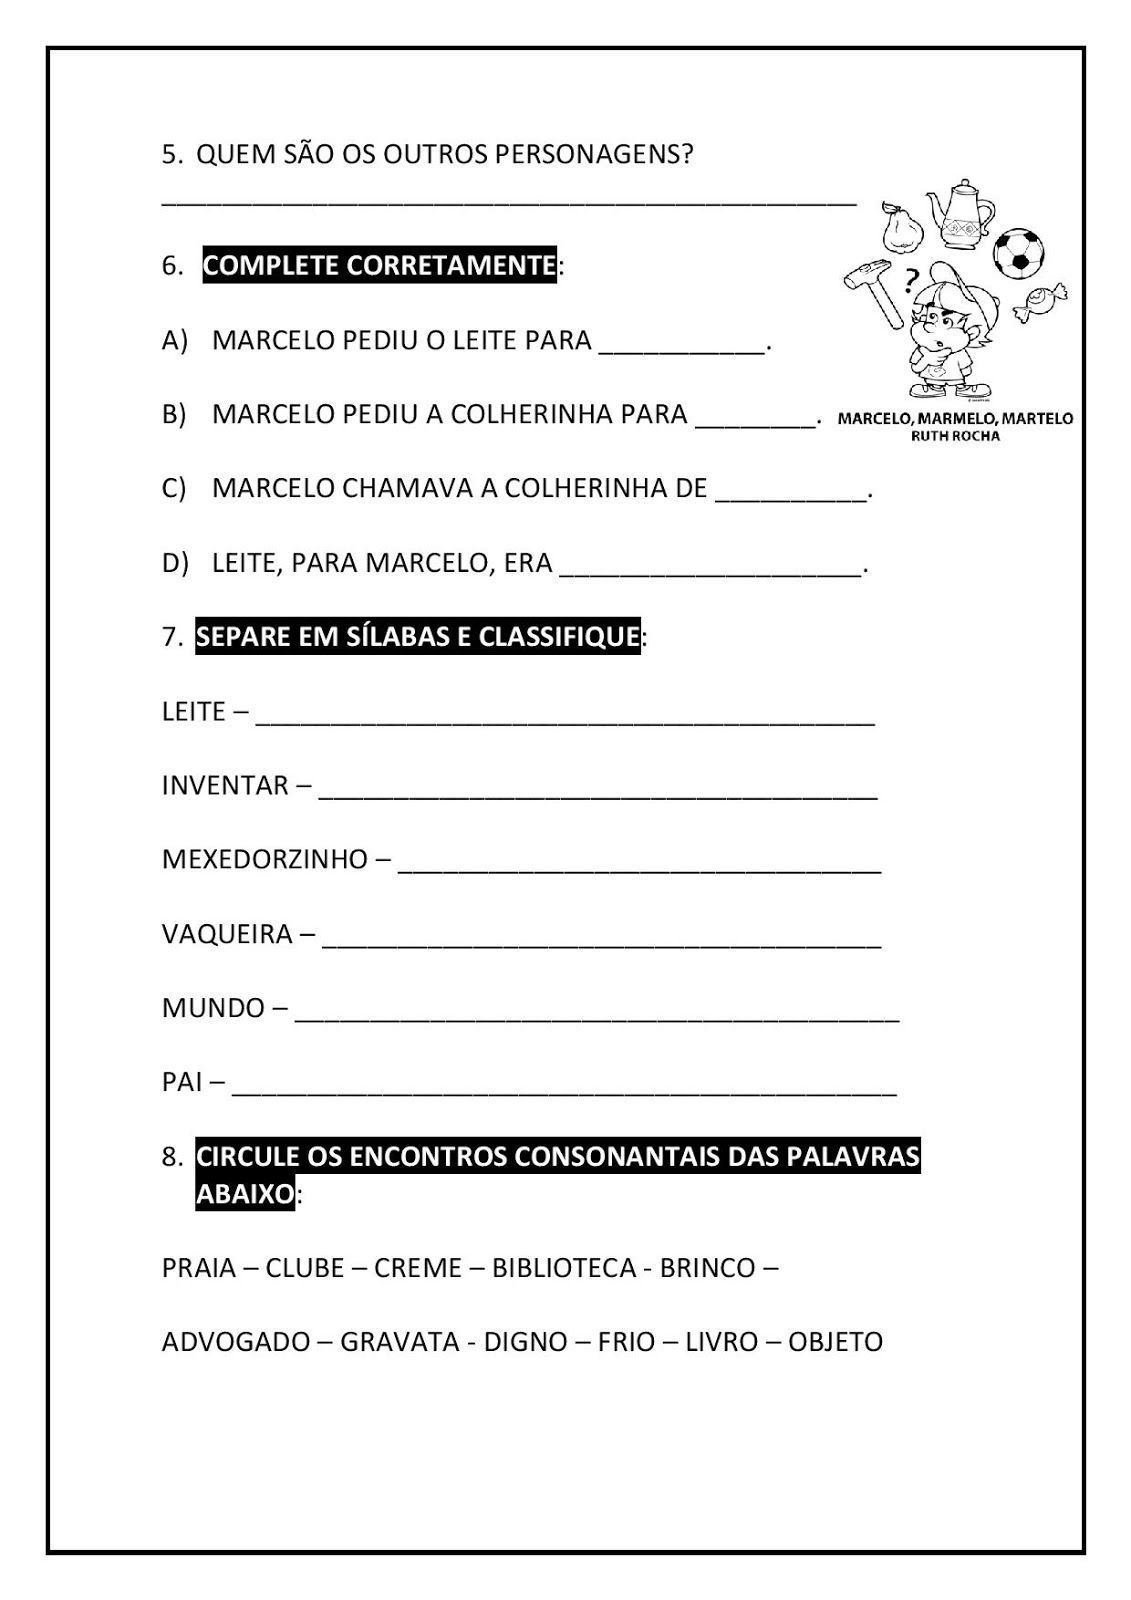 Marcelo Marmelo Martelo Page 002 Jpg 1131 1600 Atividades